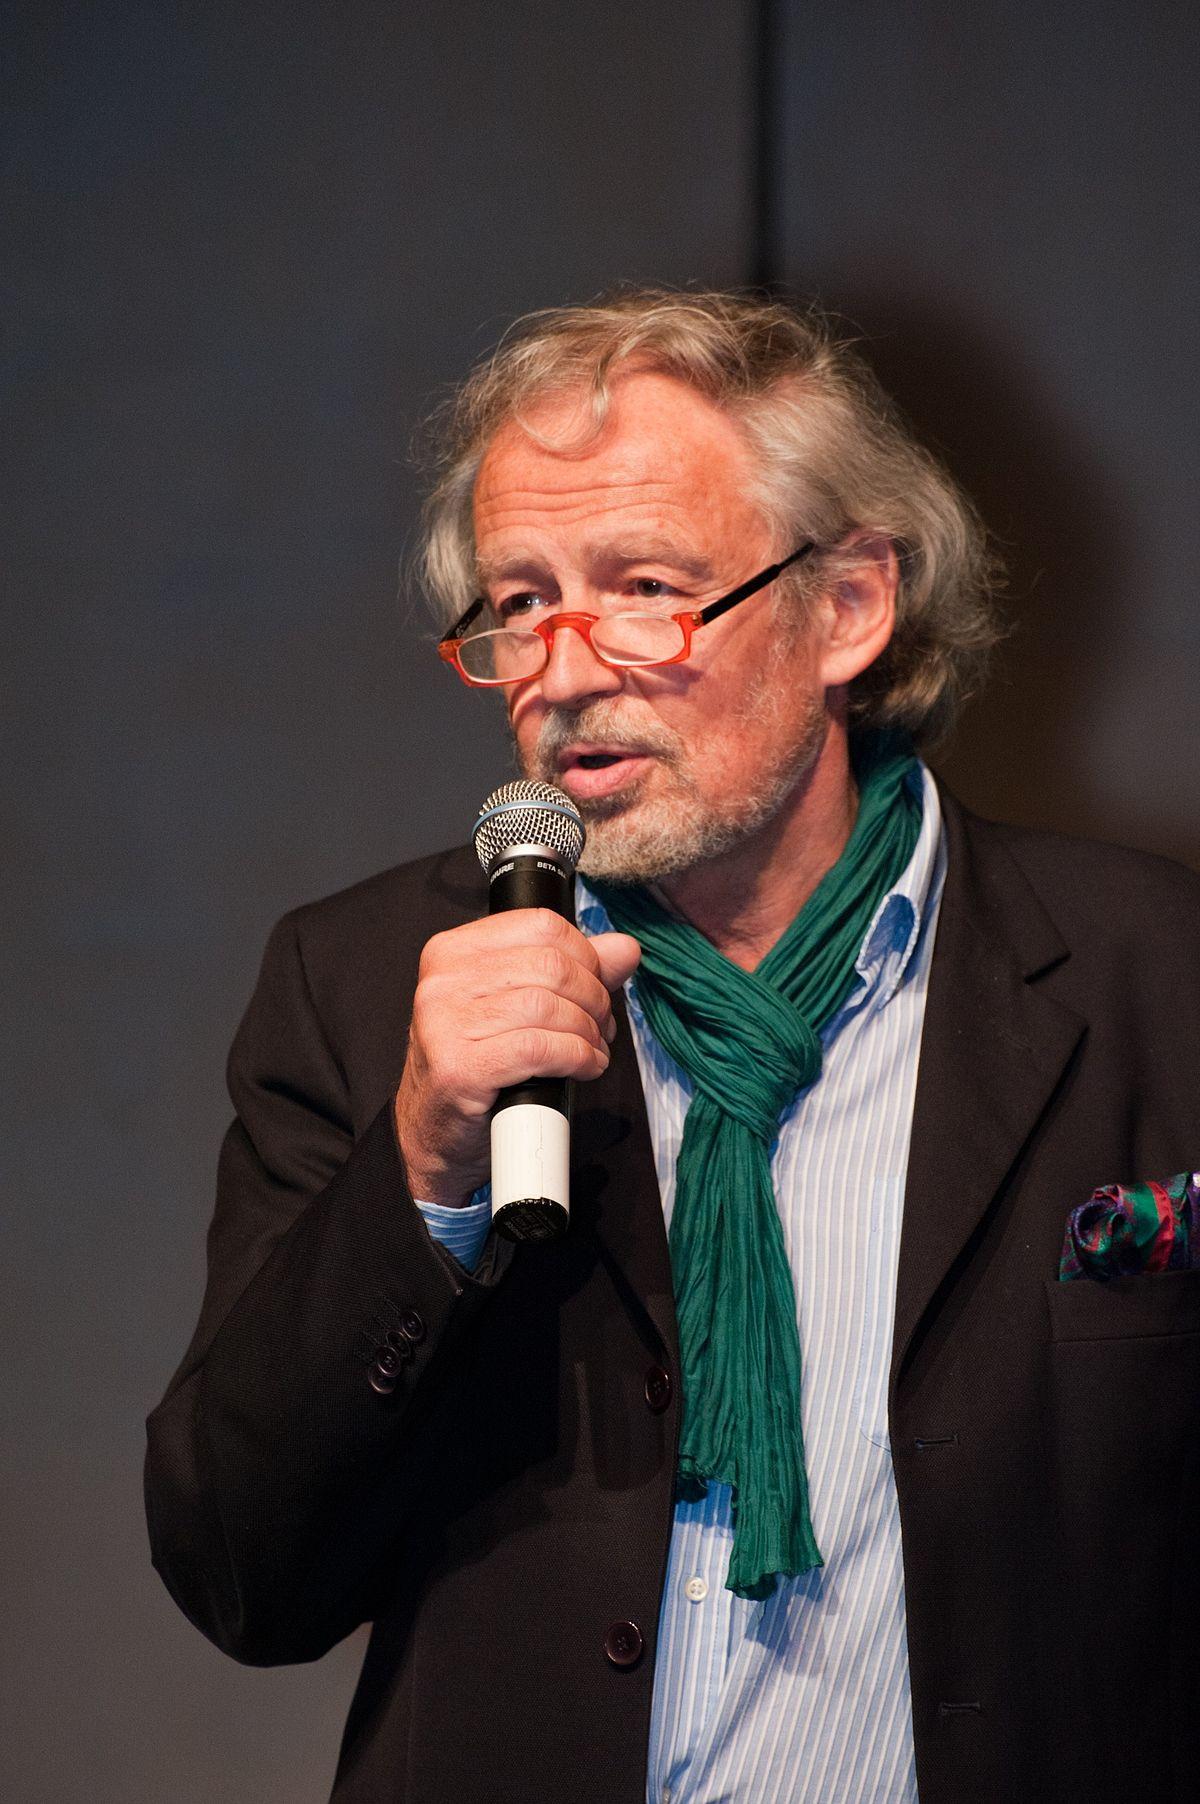 Hubert Christian Ehalt – Wikipedia